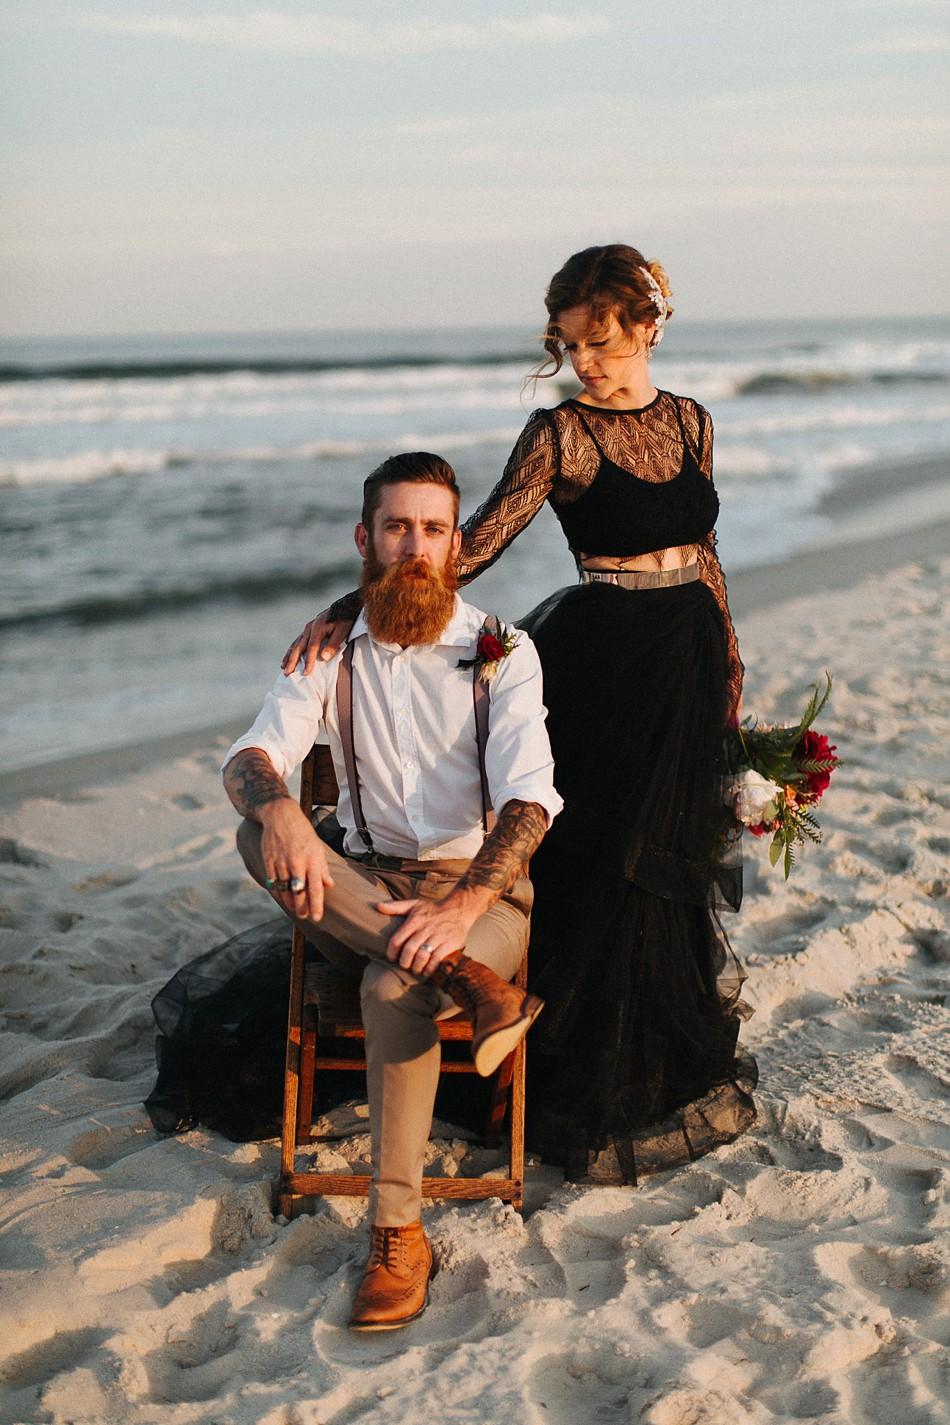 game_of_thrones_wedding42.jpg